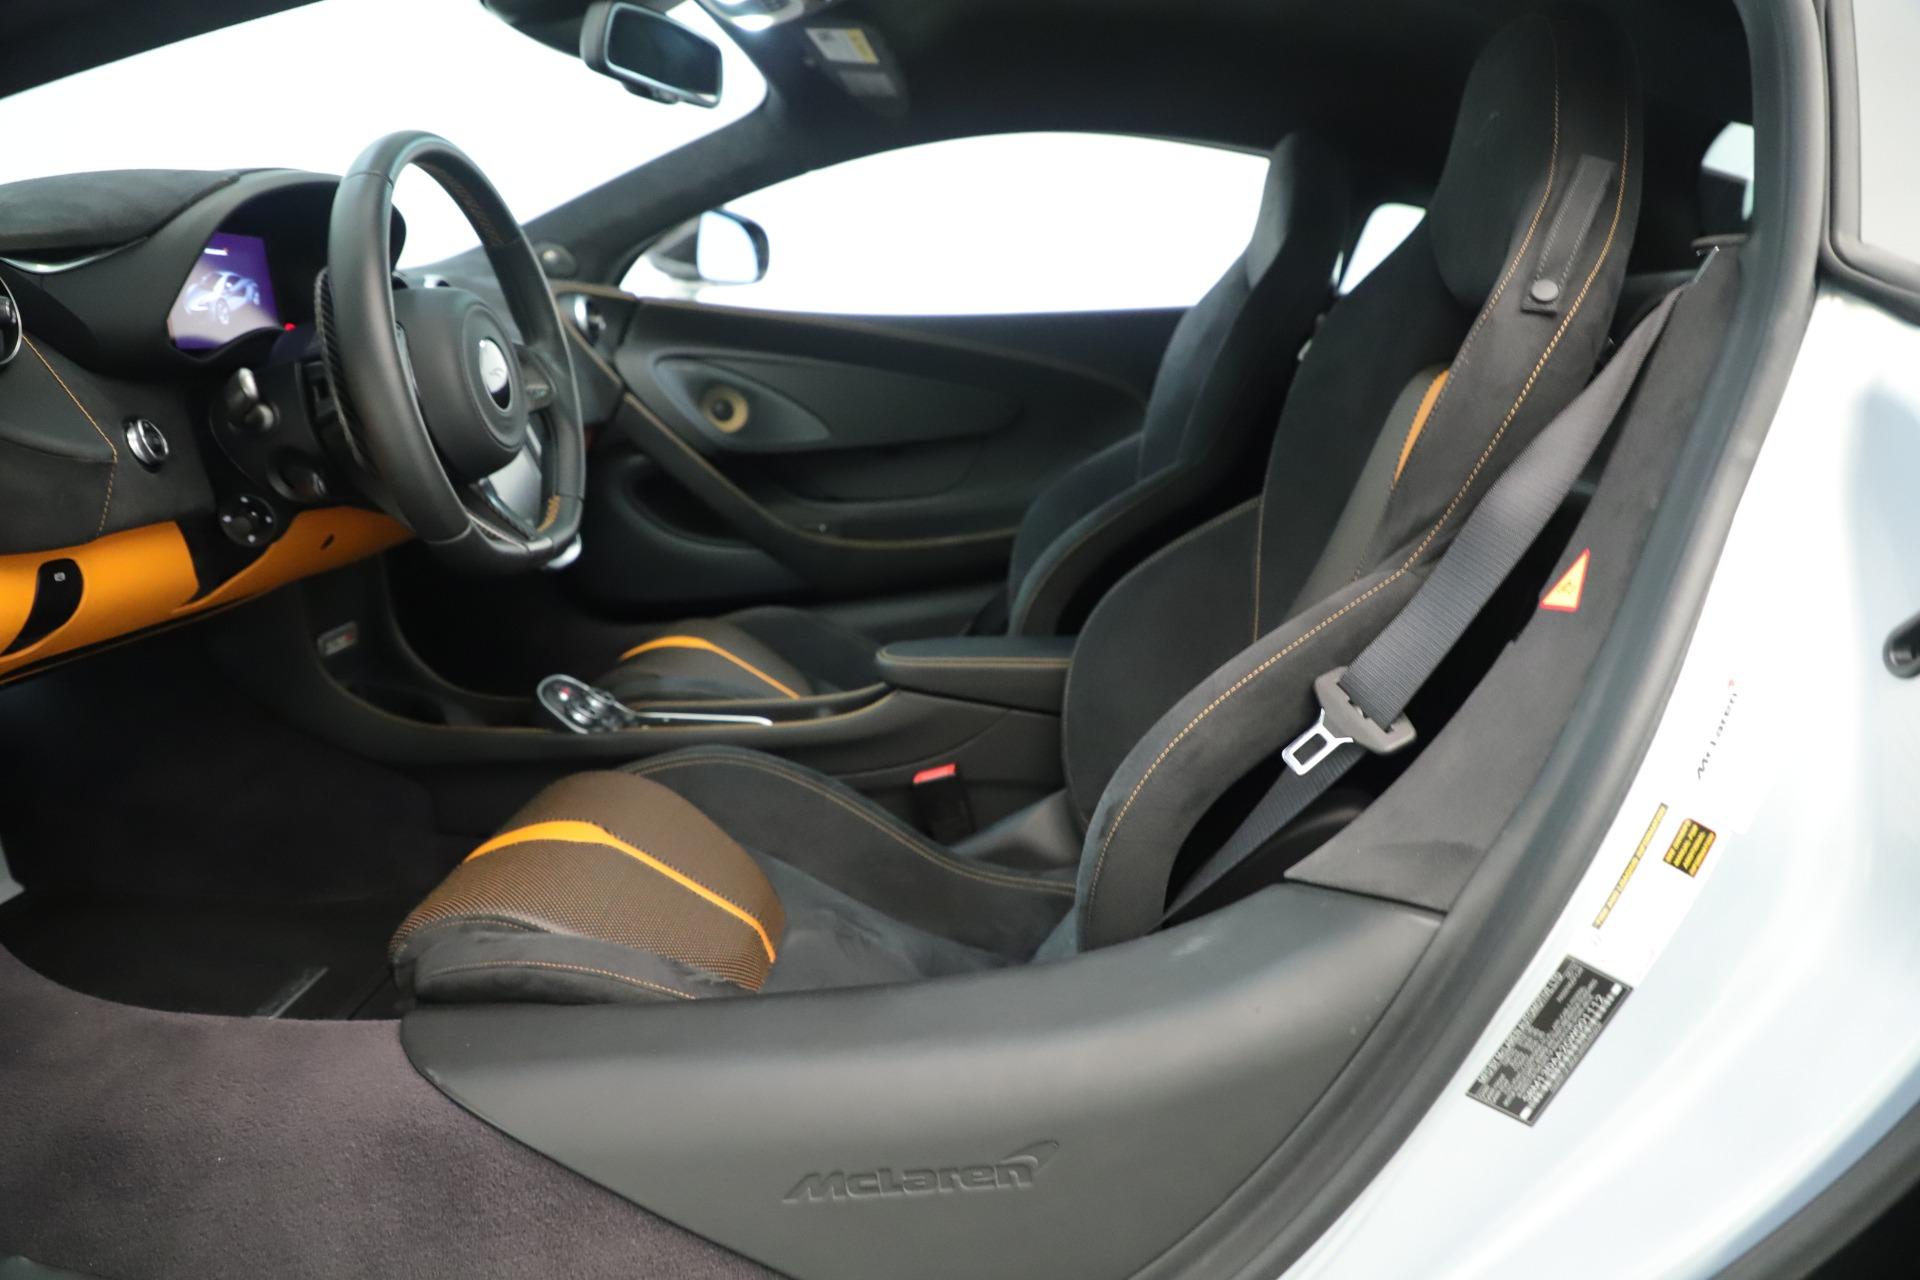 Used 2016 McLaren 570S Coupe For Sale In Westport, CT 3433_p14